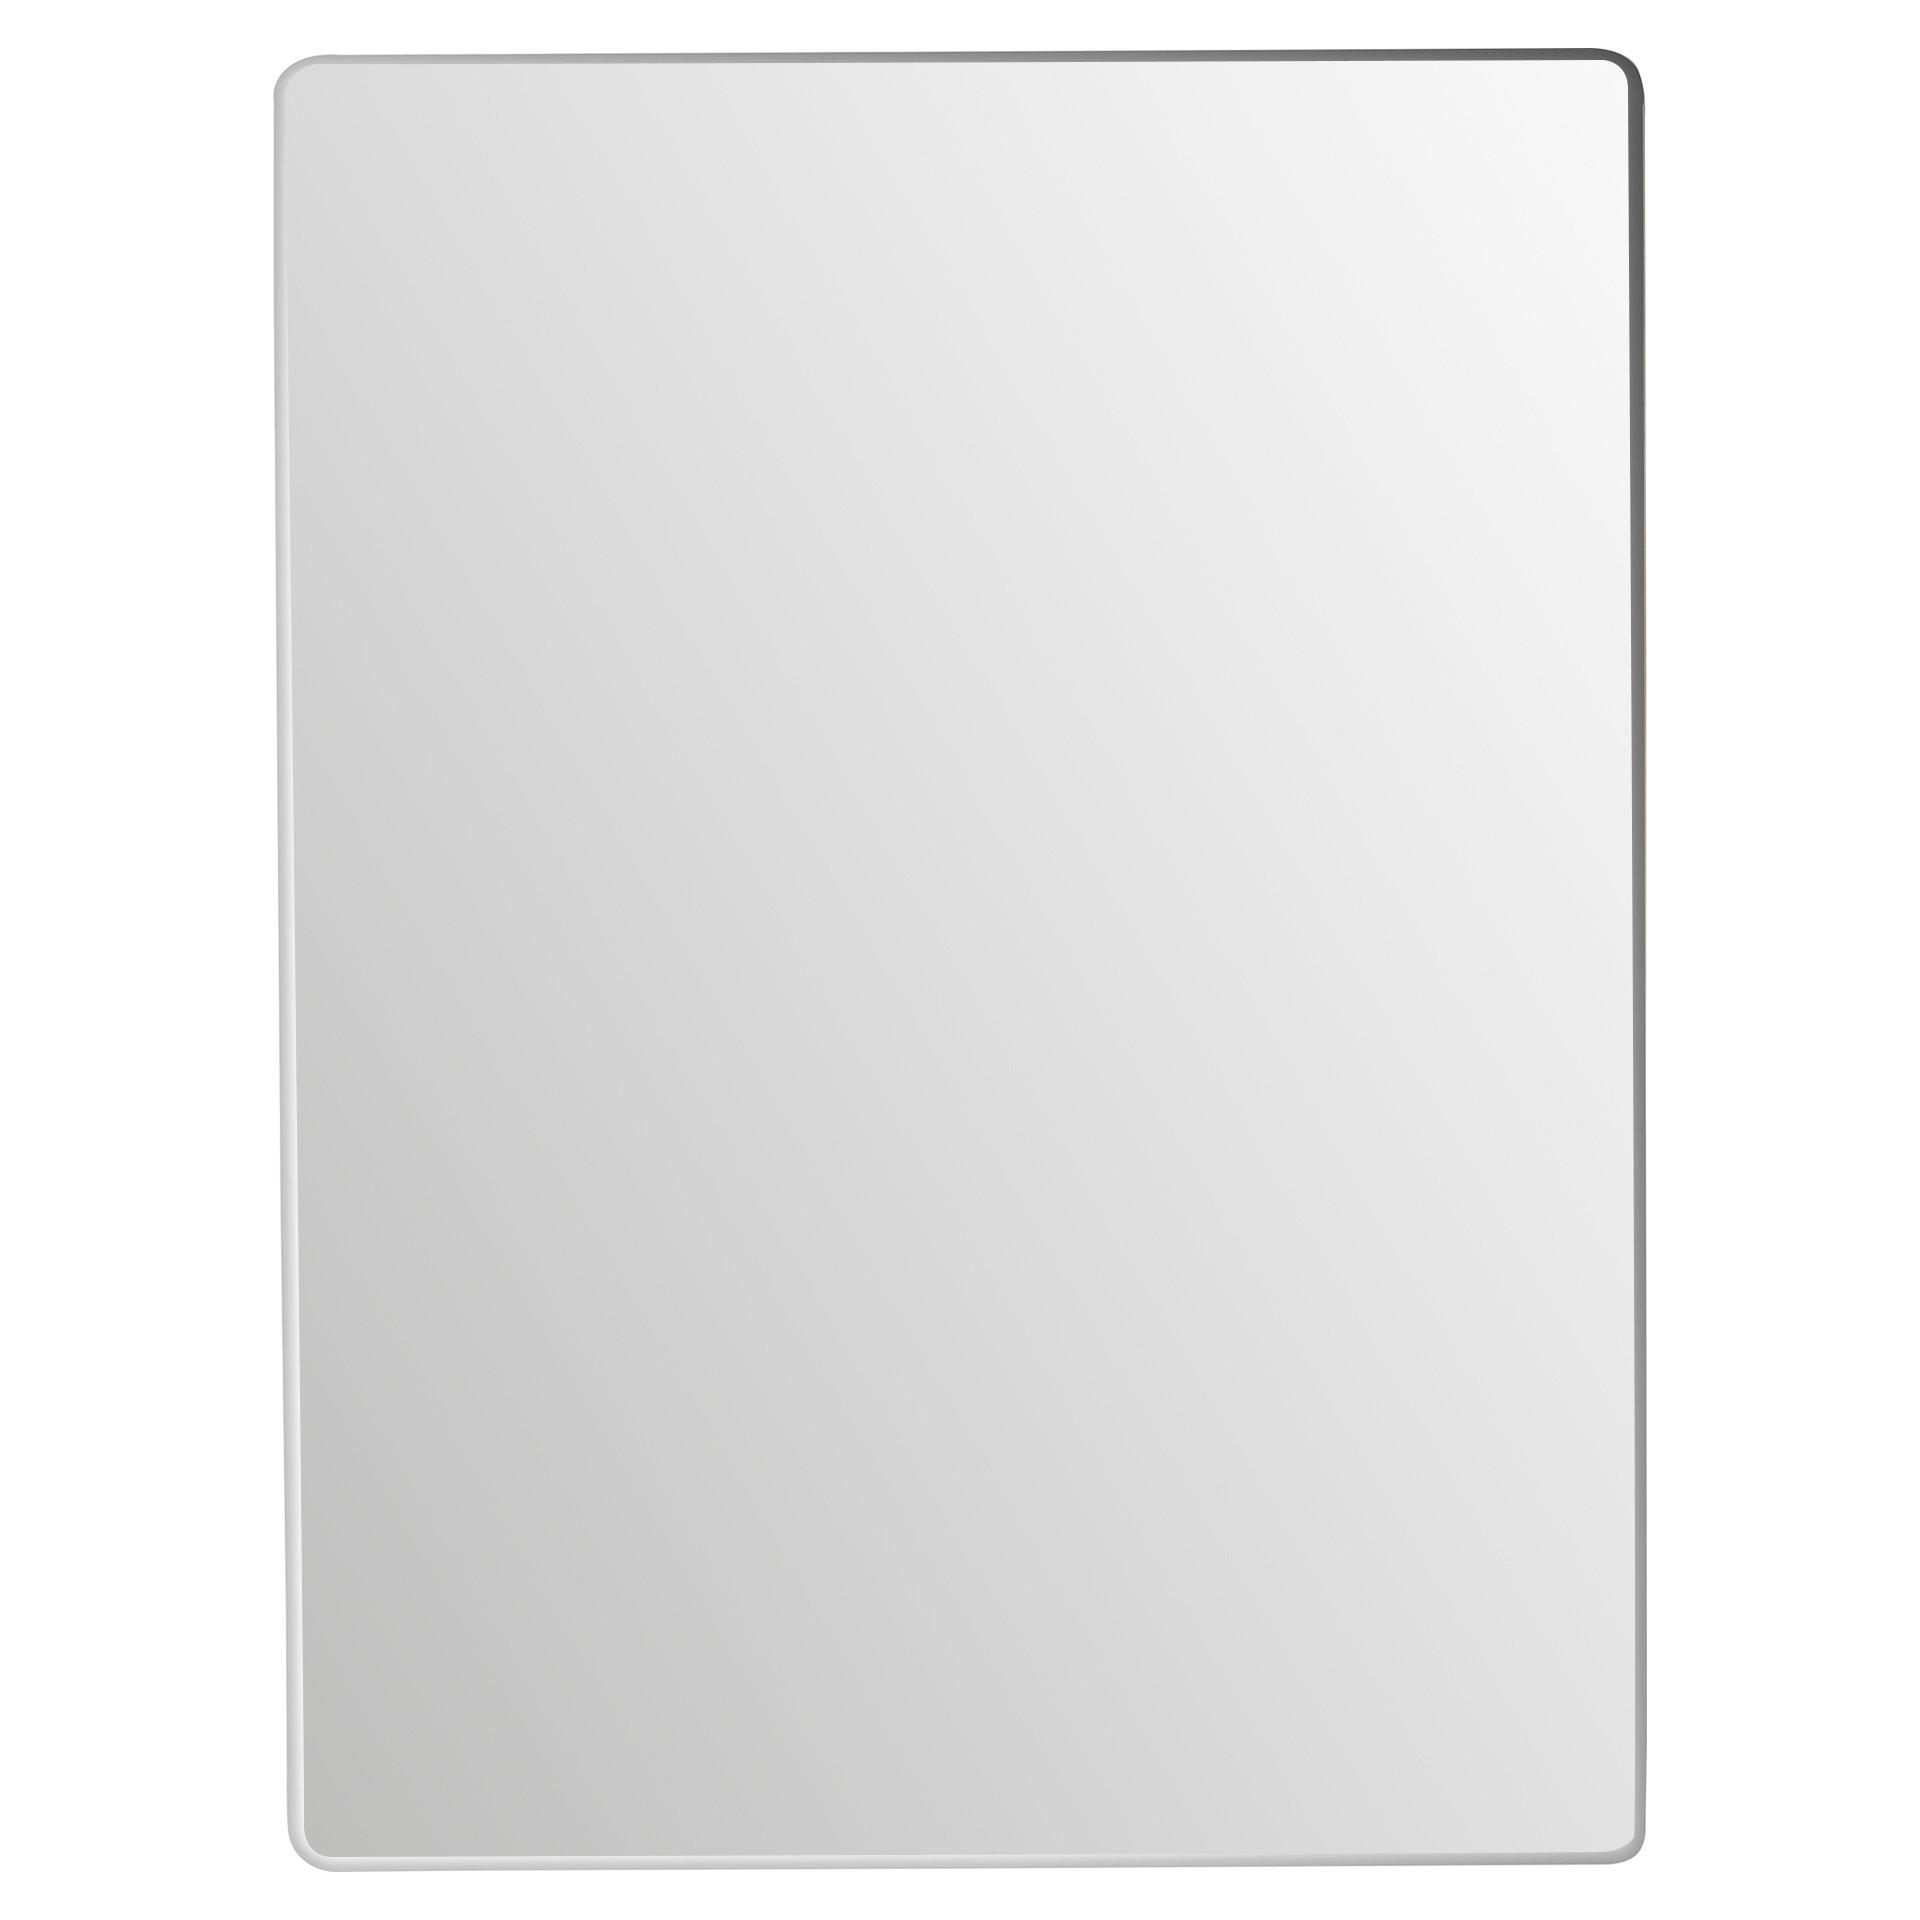 Kayden Accent Mirror In Kayden Accent Mirrors (View 5 of 20)